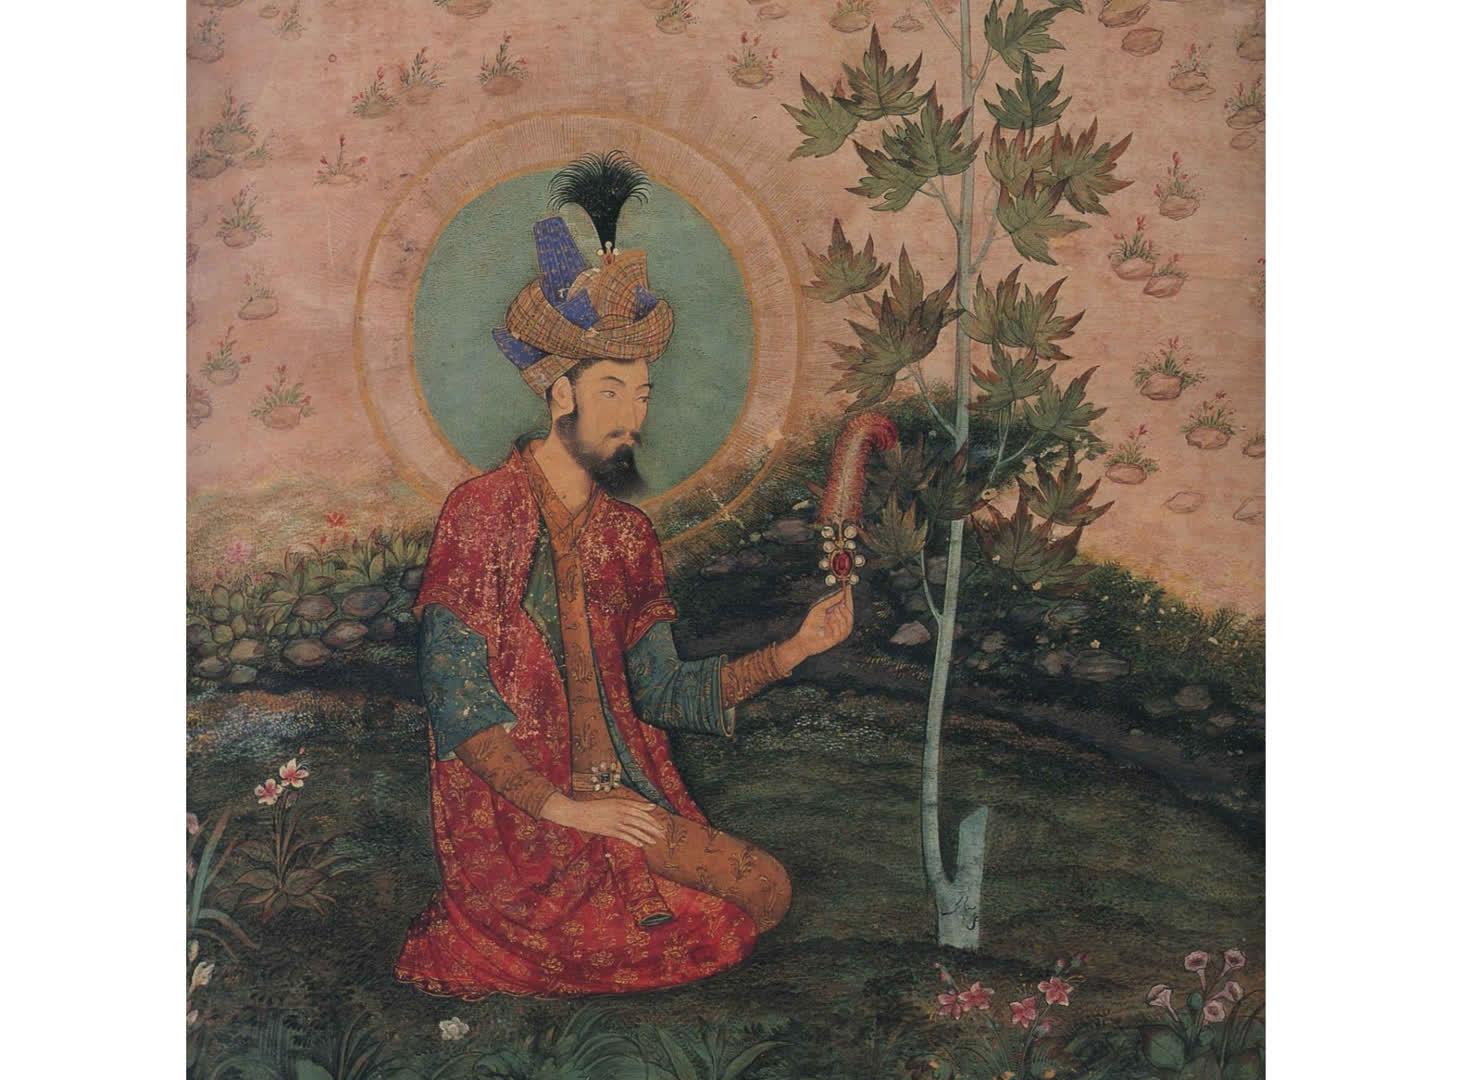 Mughal Emperor Humayun